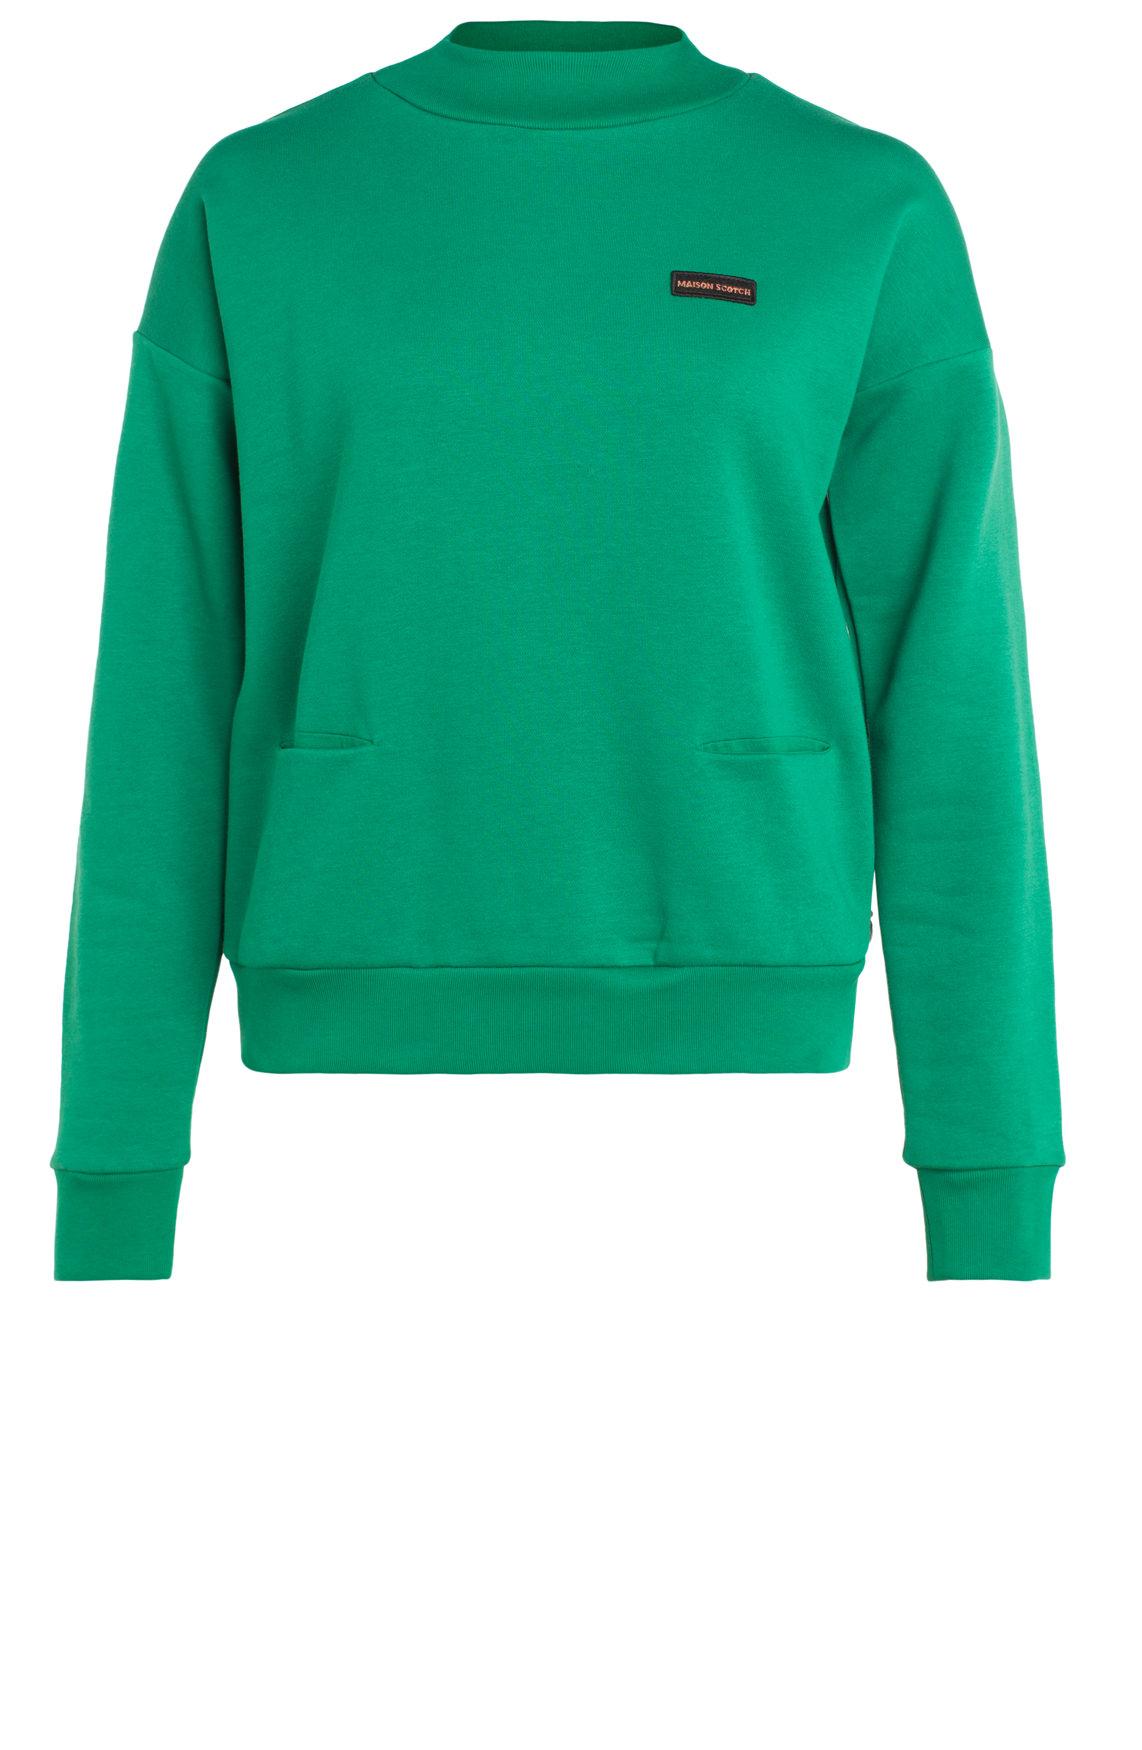 Maison Scotch Dames Sweater met hoge hals groen